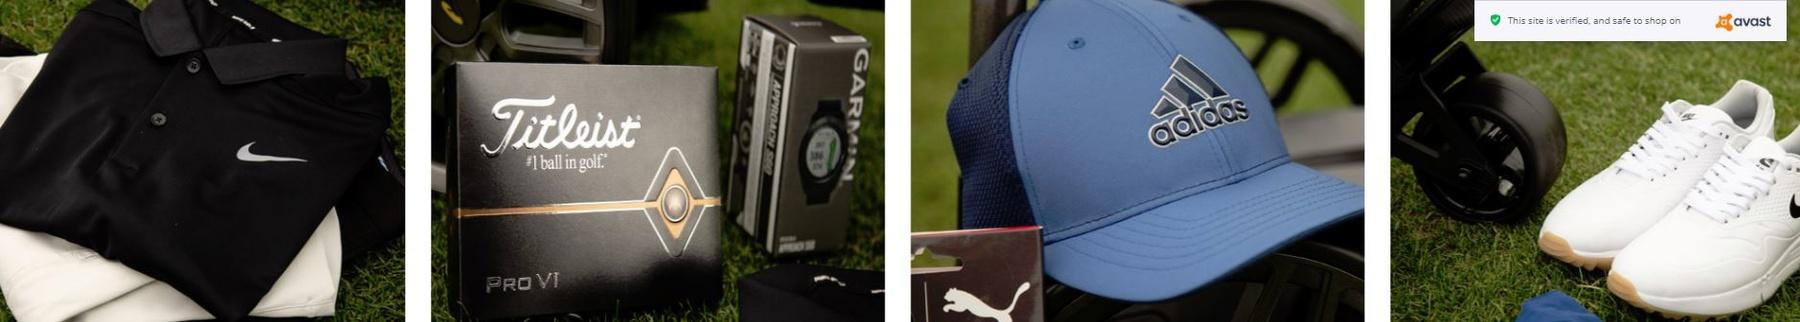 America Golf valuable prize headere